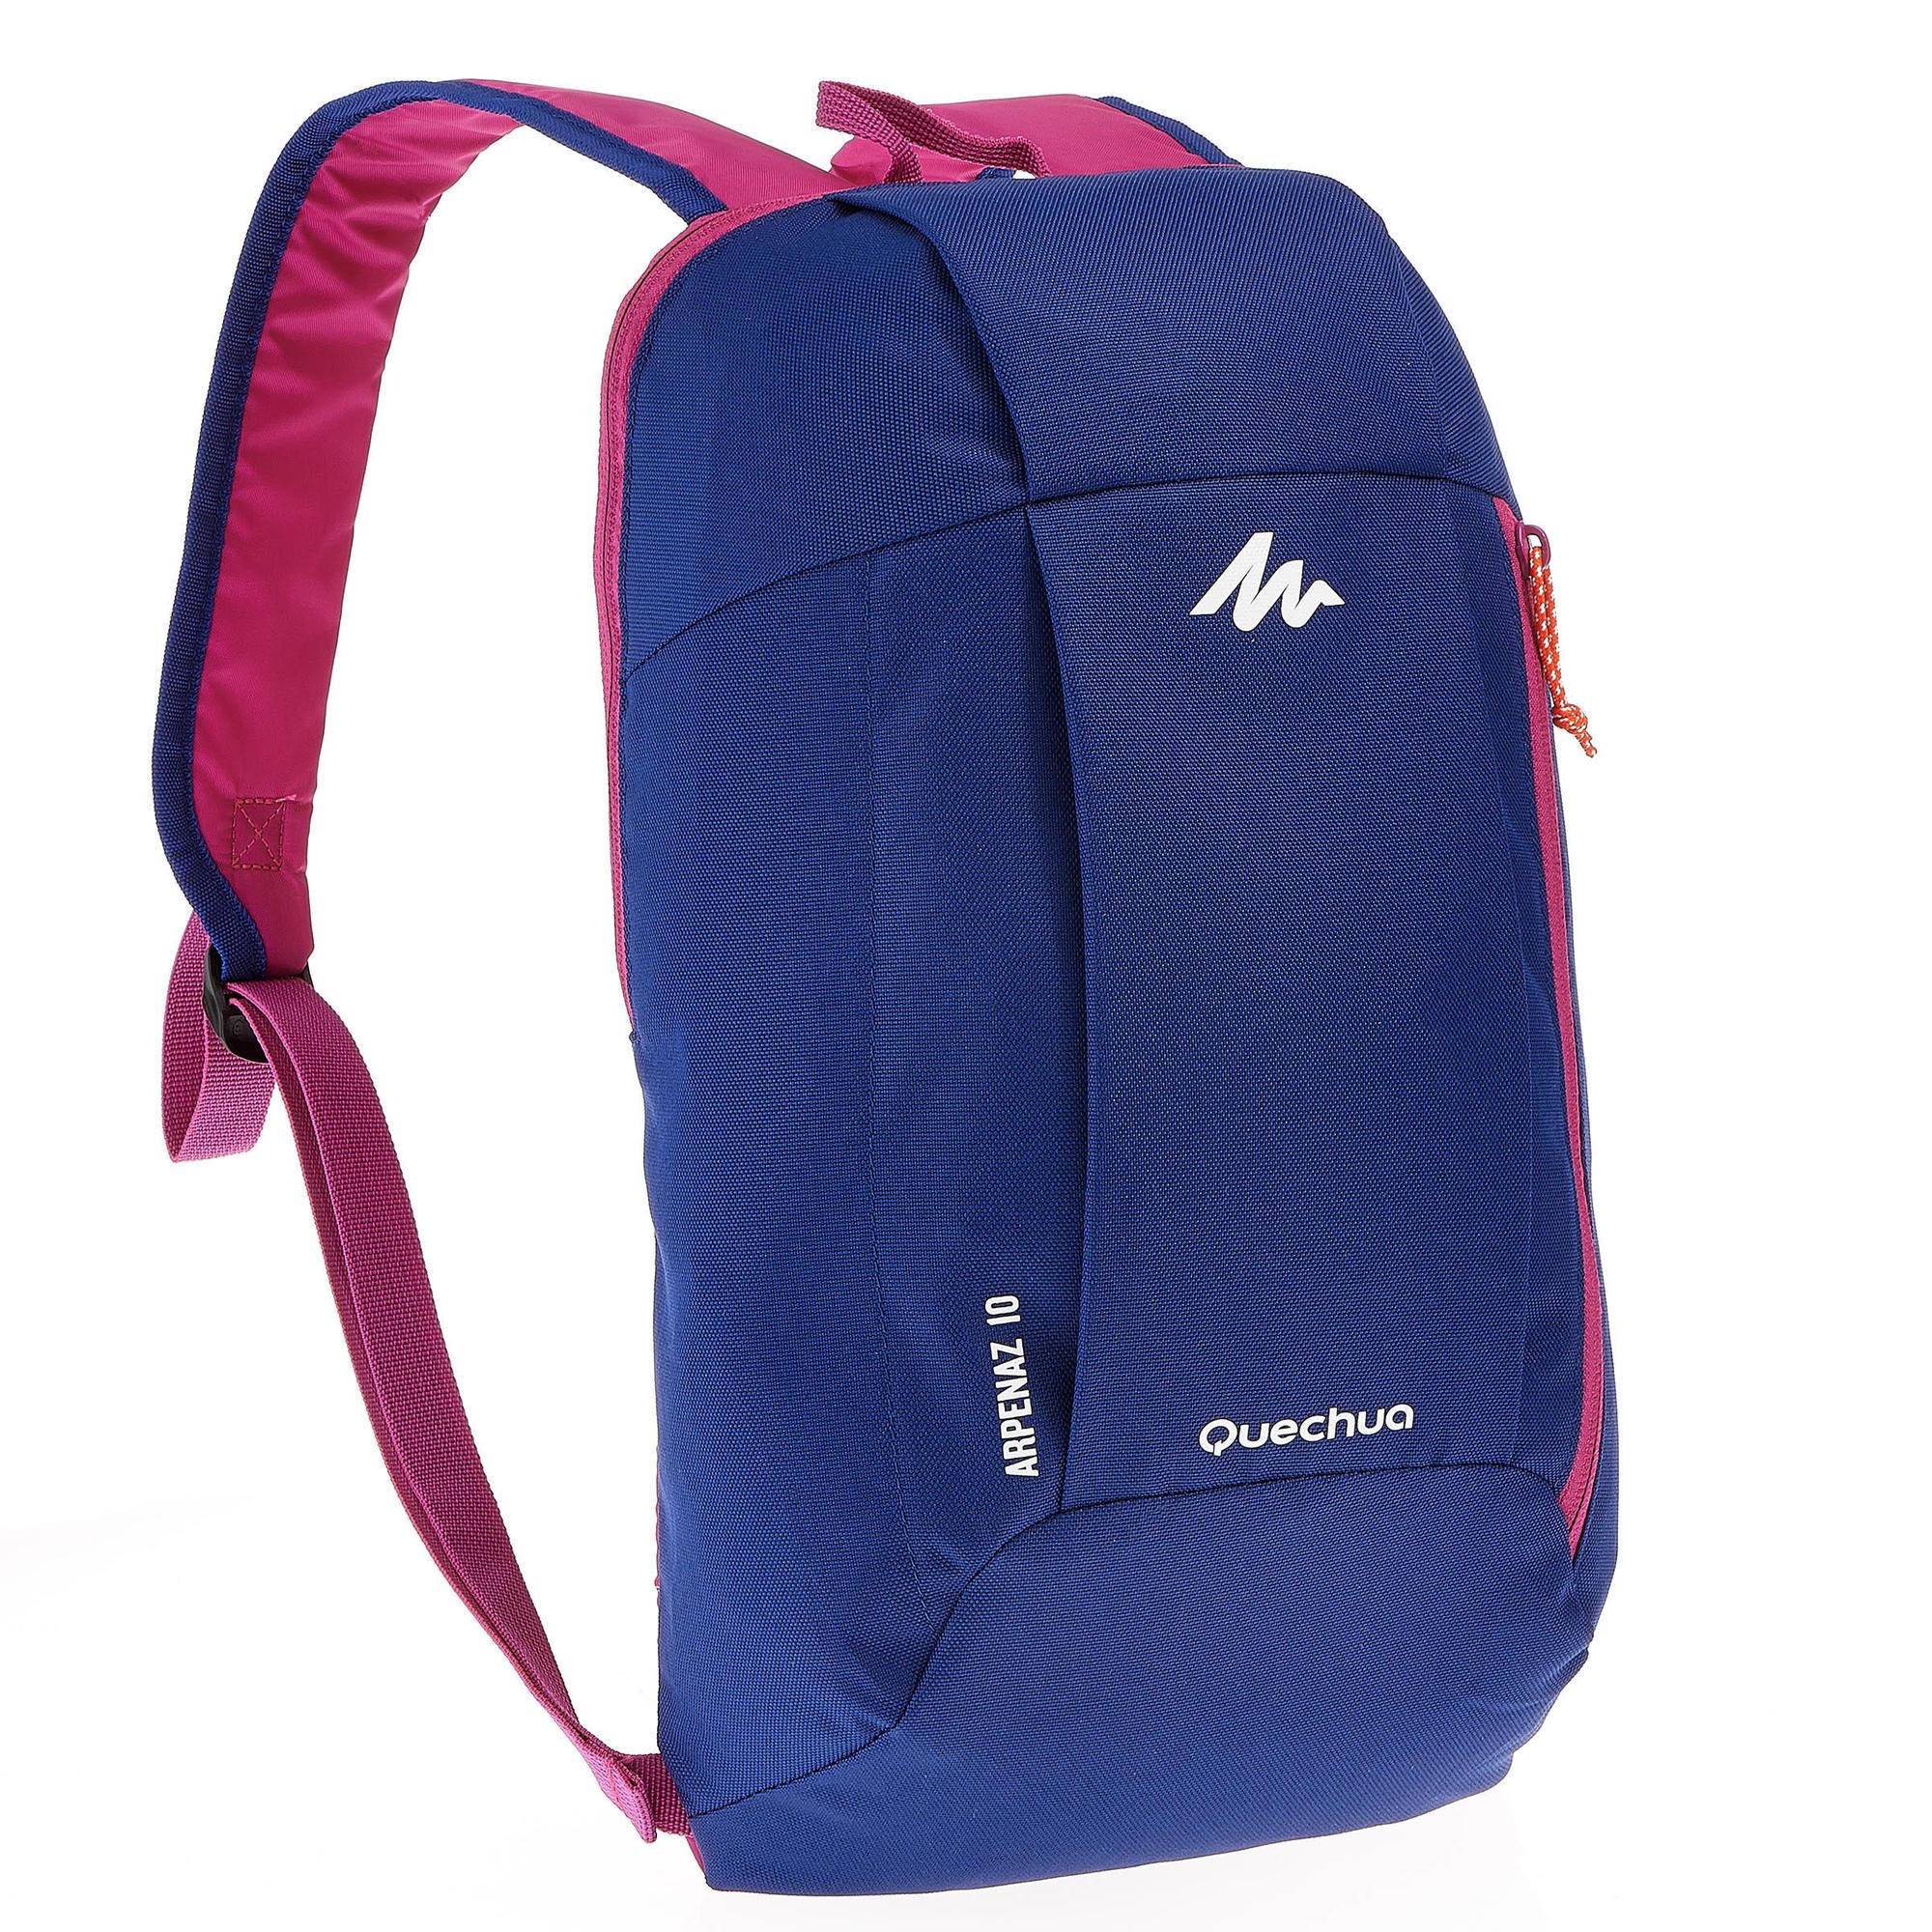 Nh100 10l Hiking Backpack Blue Purple Quechua